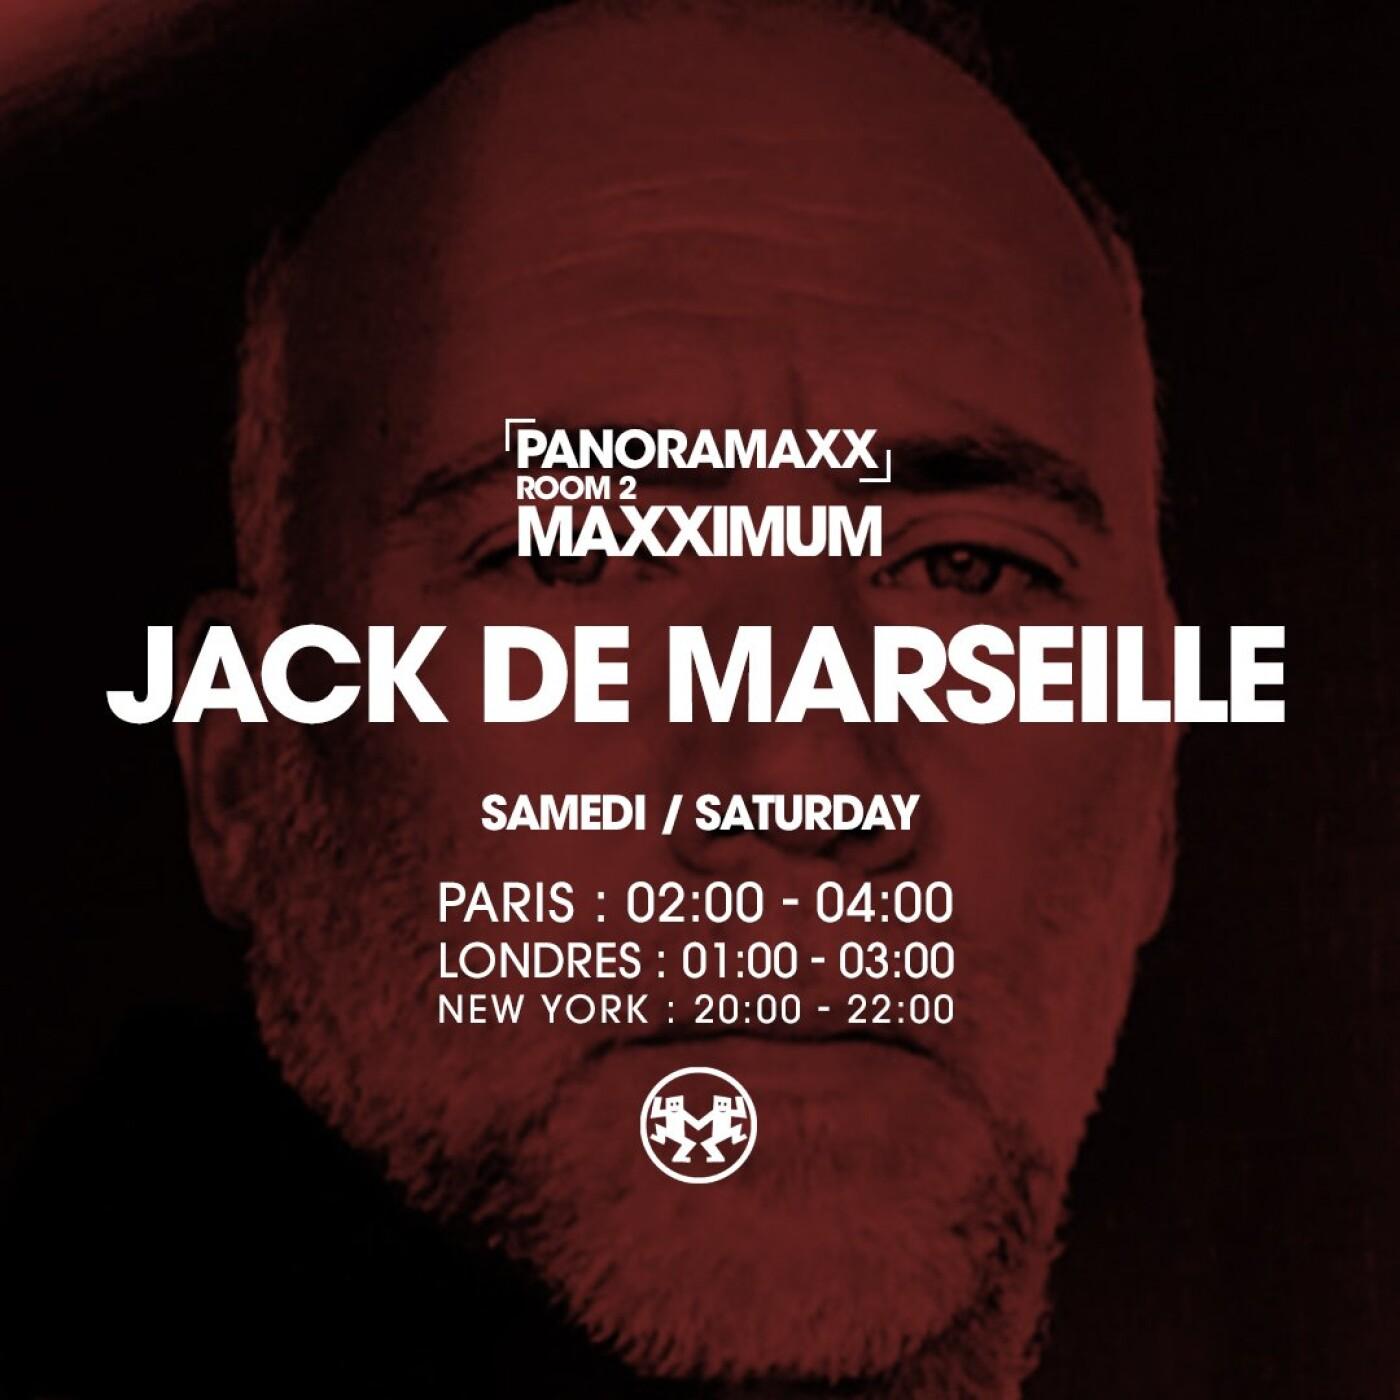 PANORAMAXX : JACK DE MARSEILLE